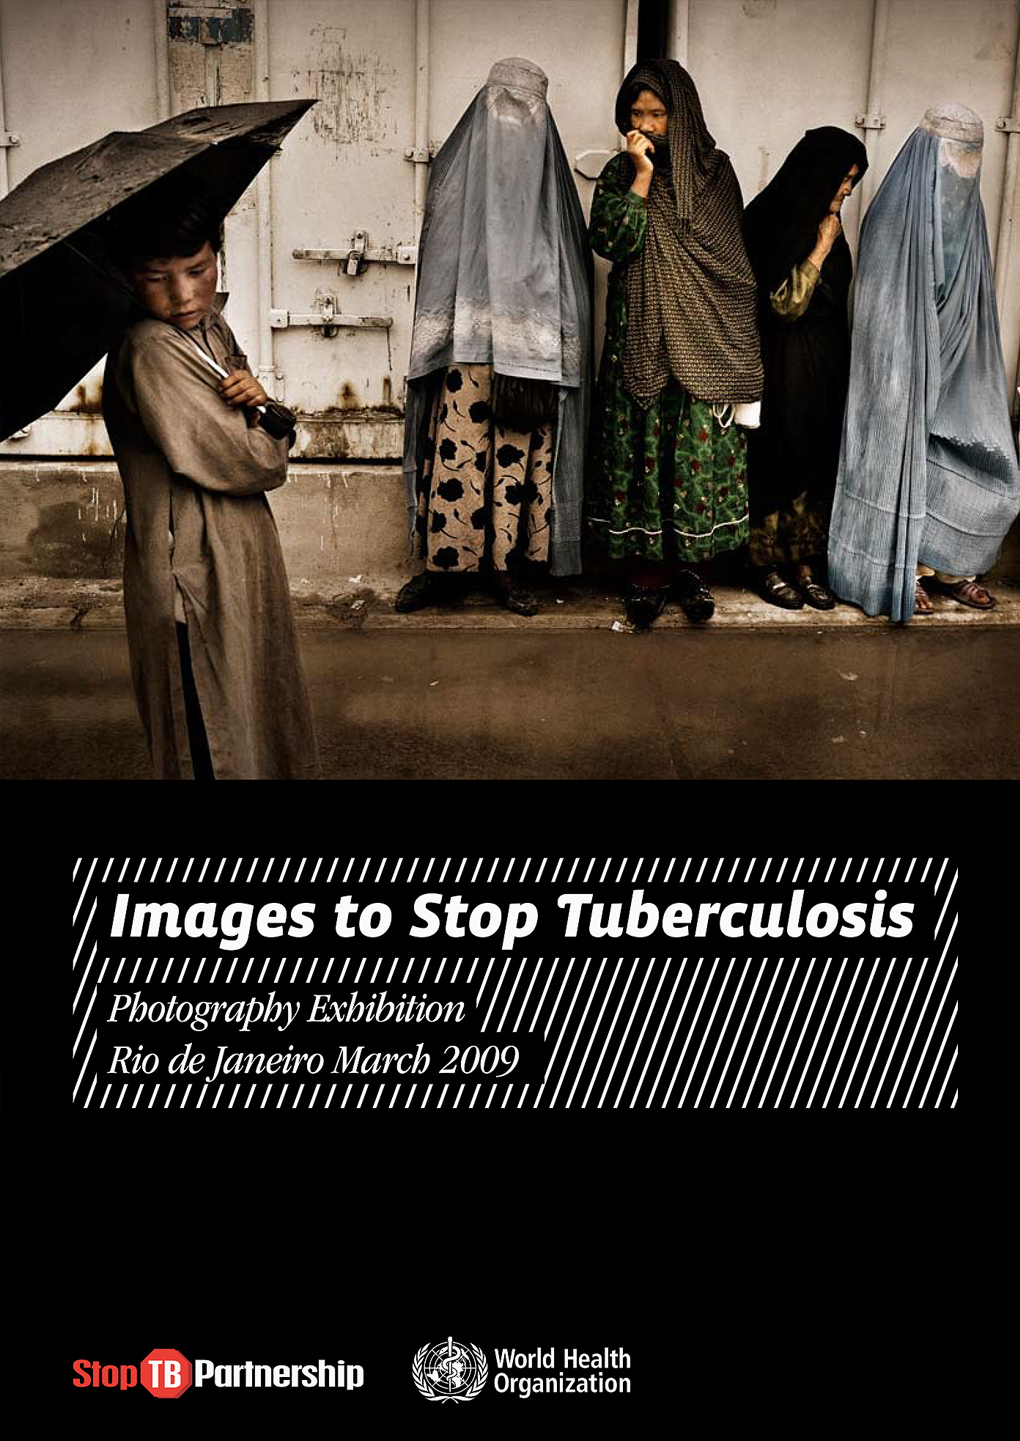 Catalogo per mostra fotografica Images to stop tuberculosis - Graphic Design Mirko Neri